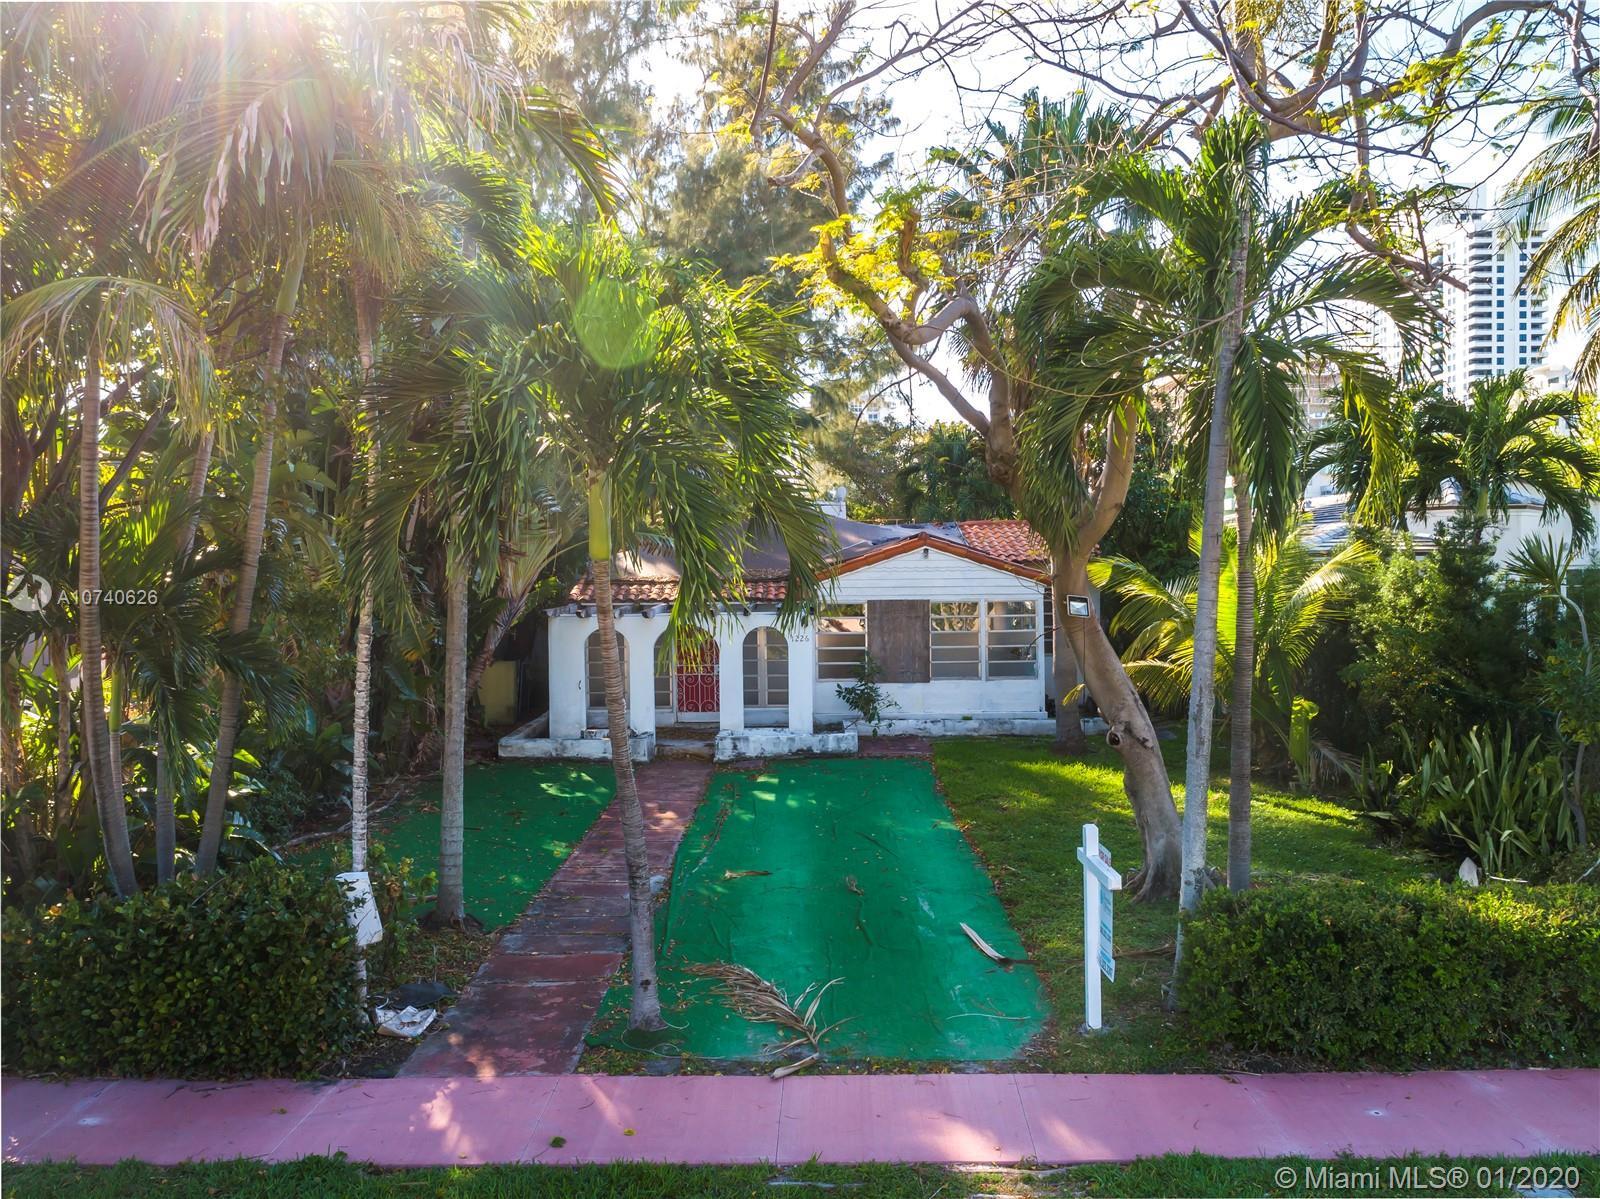 1226 Lenox Ave - Miami Beach, Florida